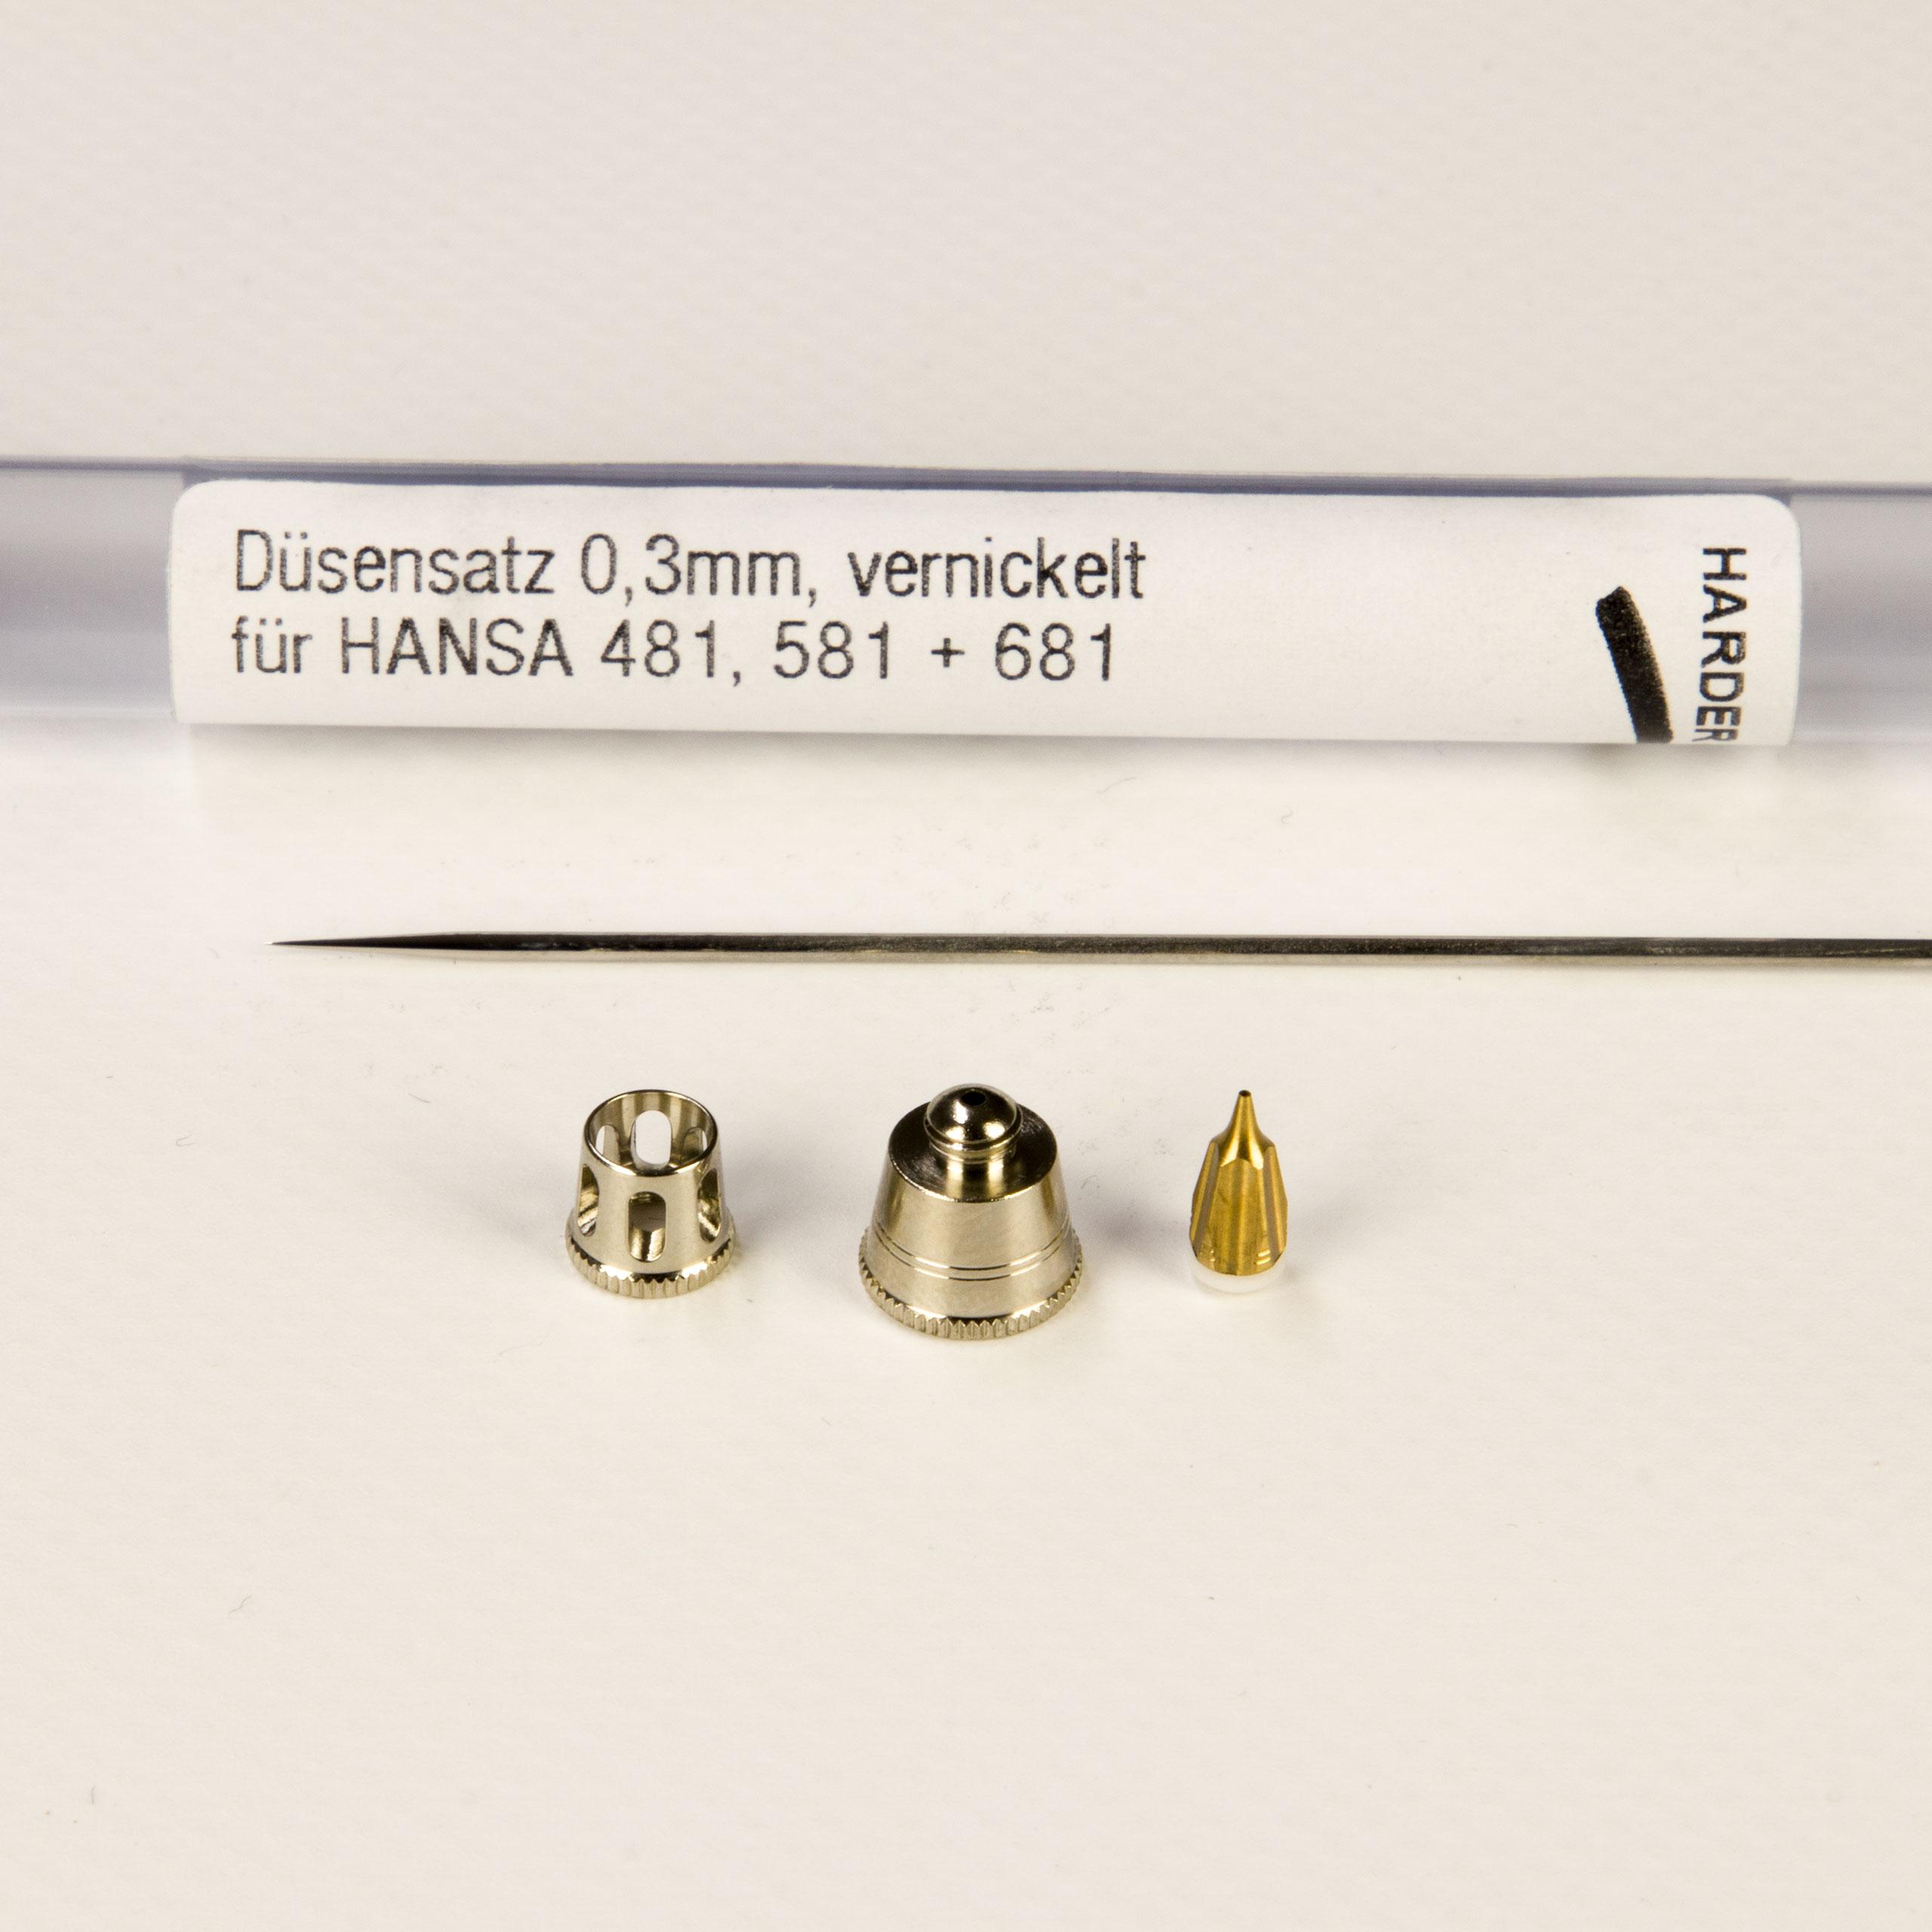 Düsensatz 0,3mm 218863 vernickelt fuer Hansa